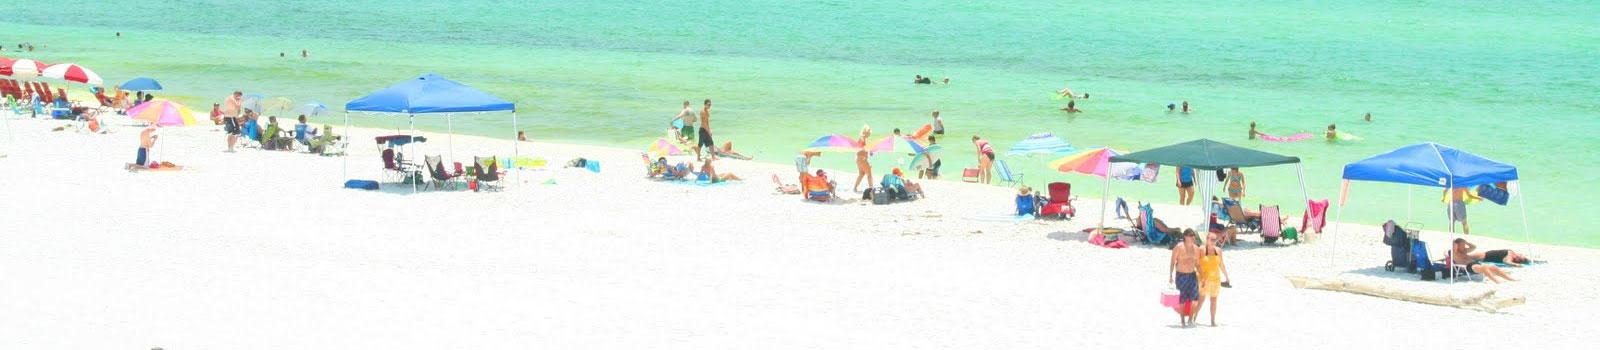 gugrat beach